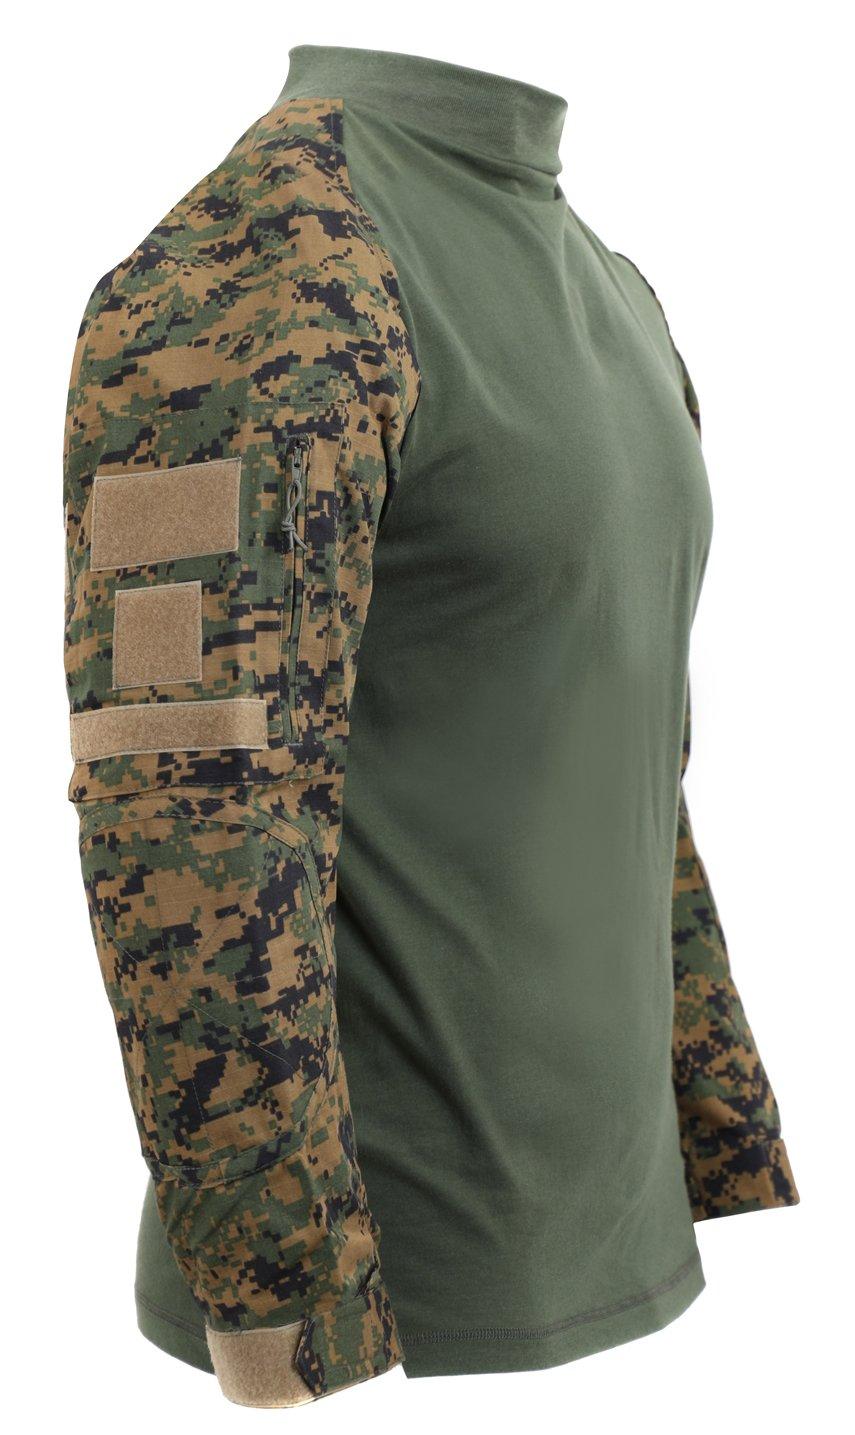 Rothco Tactical Airsoft Combat Shirt, Woodland Digital Camo, L